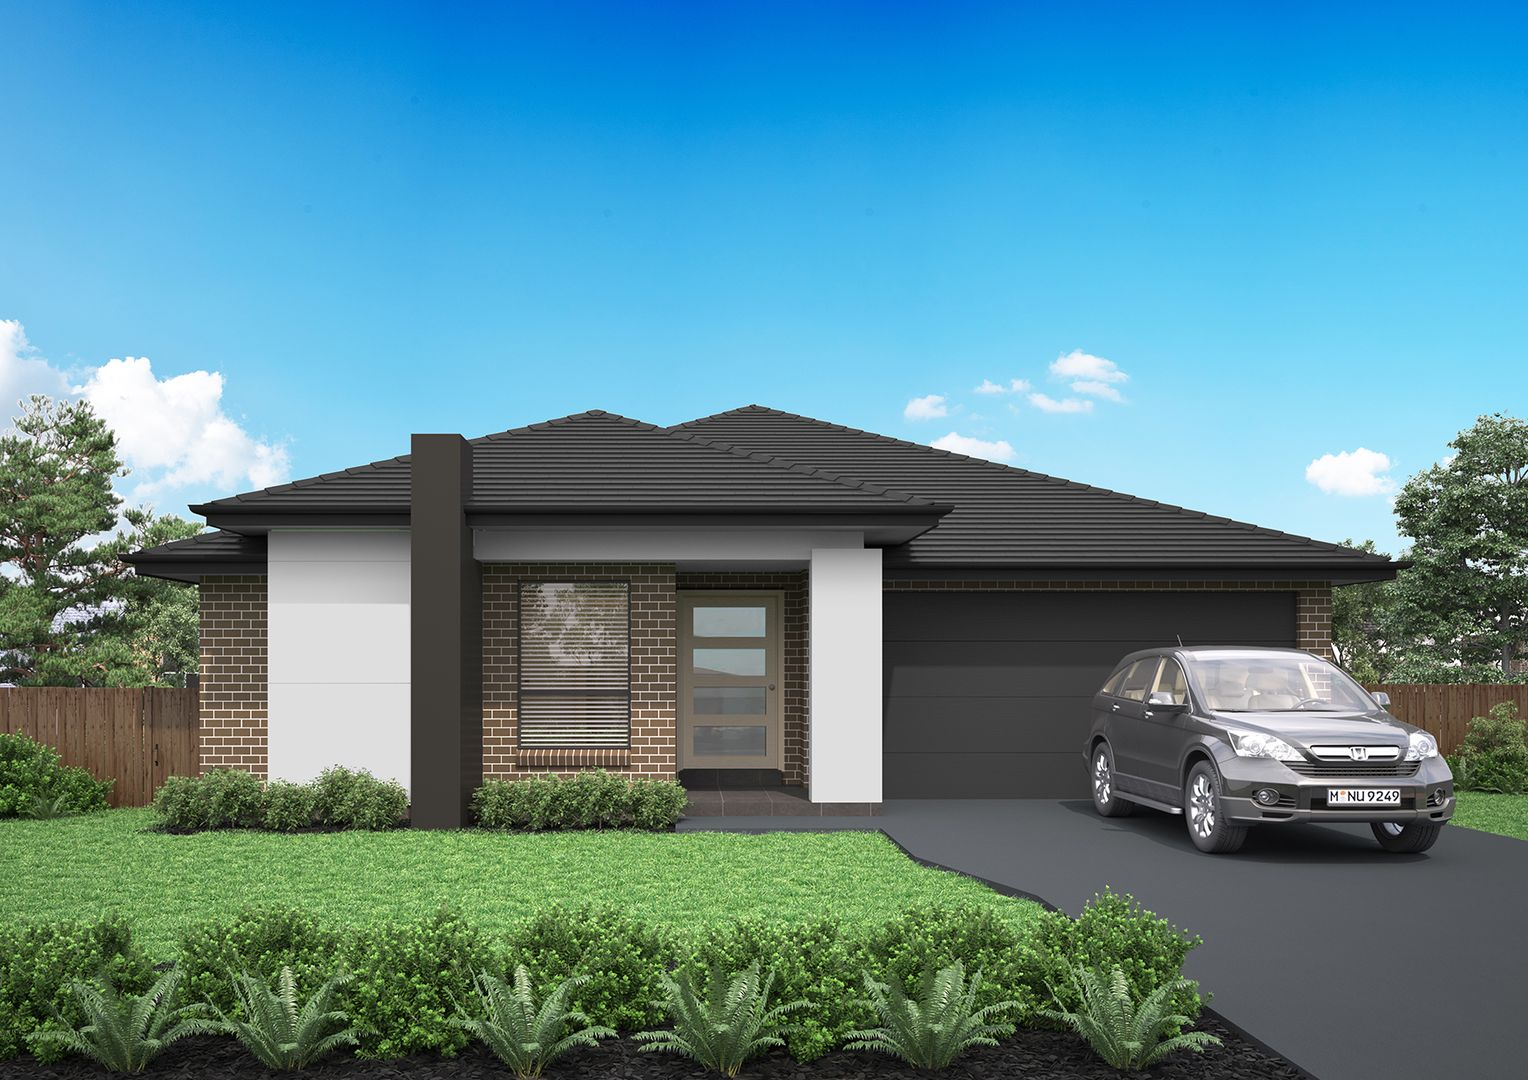 Lot 1115 Greystones Drive, Chisholm NSW 2322, Image 0